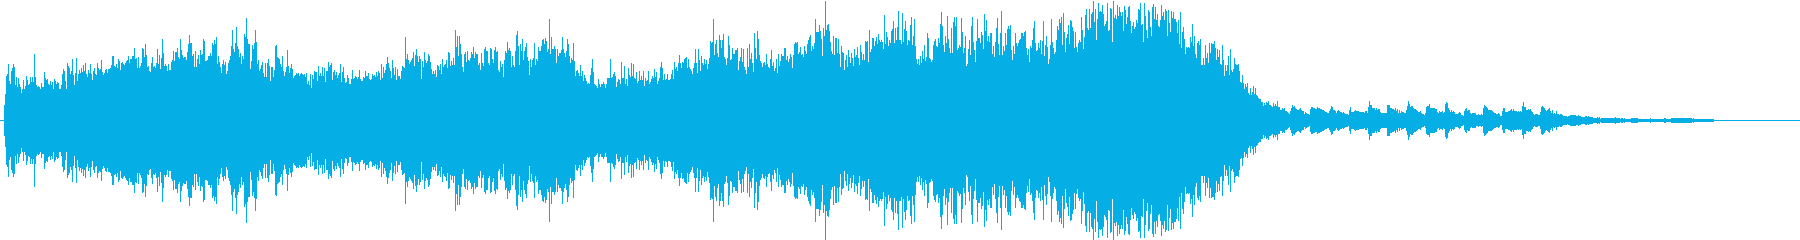 Cold Lake 30秒メロディー無しの再生済みの波形